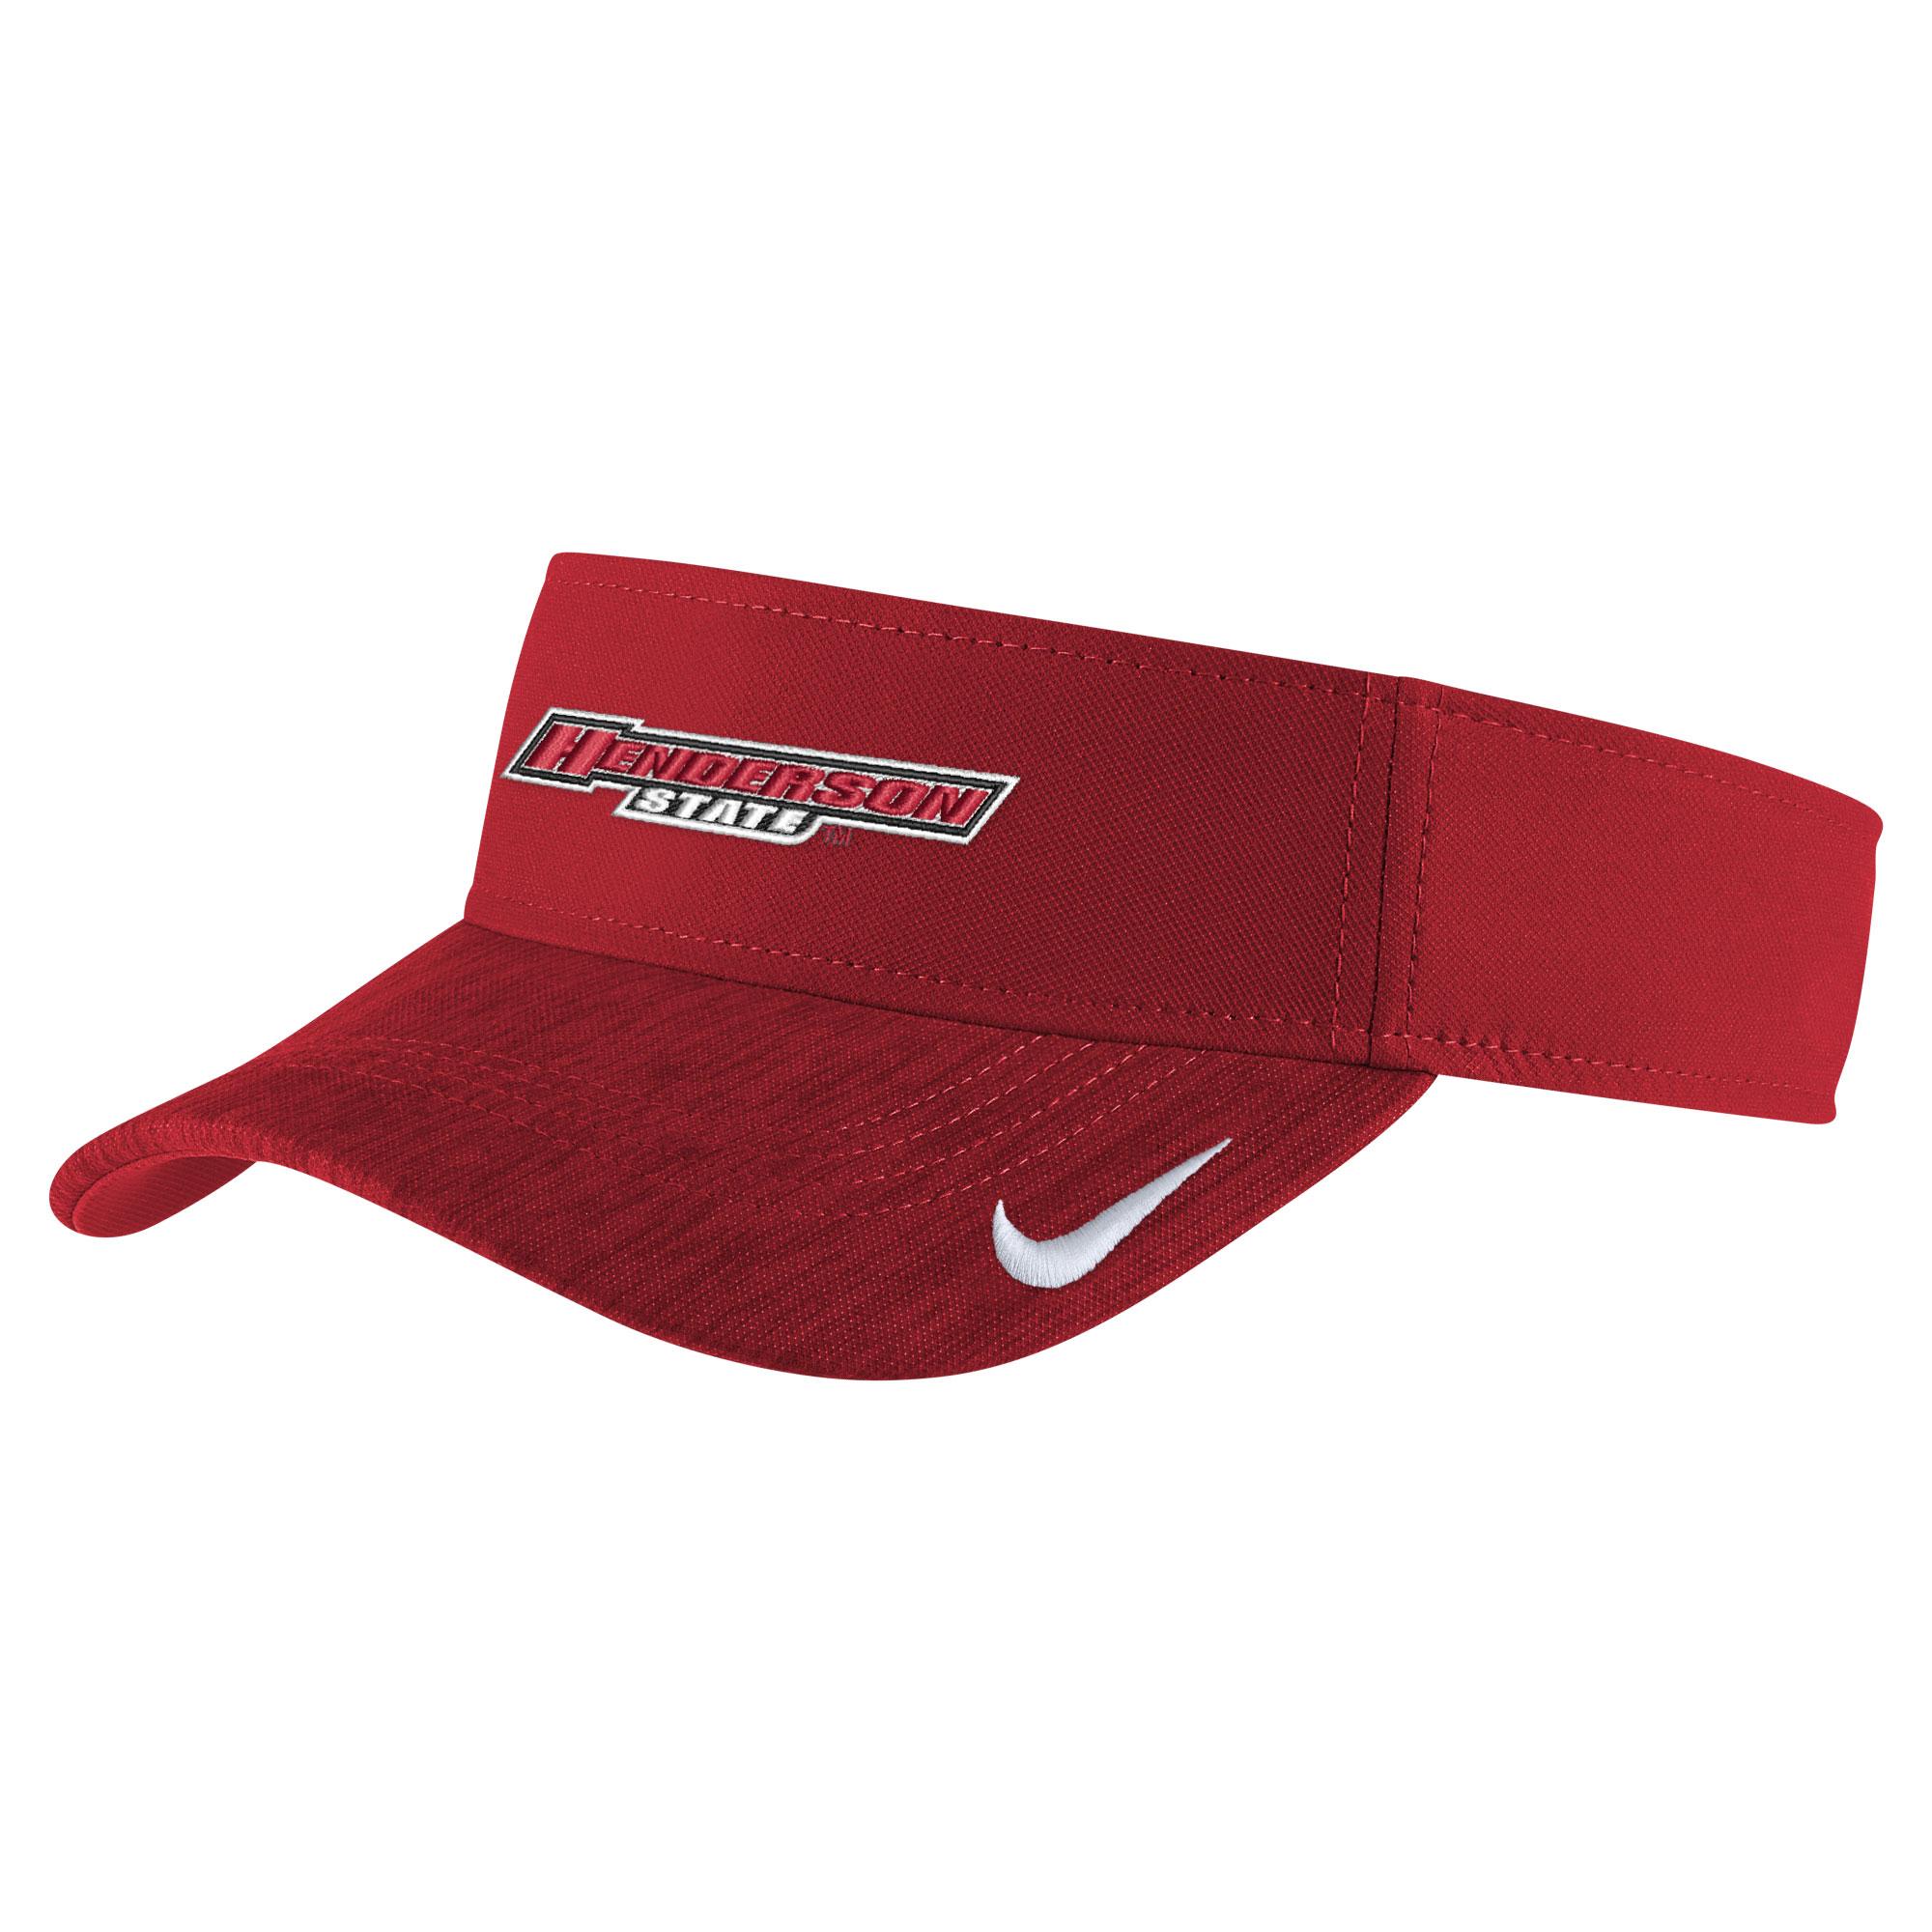 Nike Sideline Aero Visor